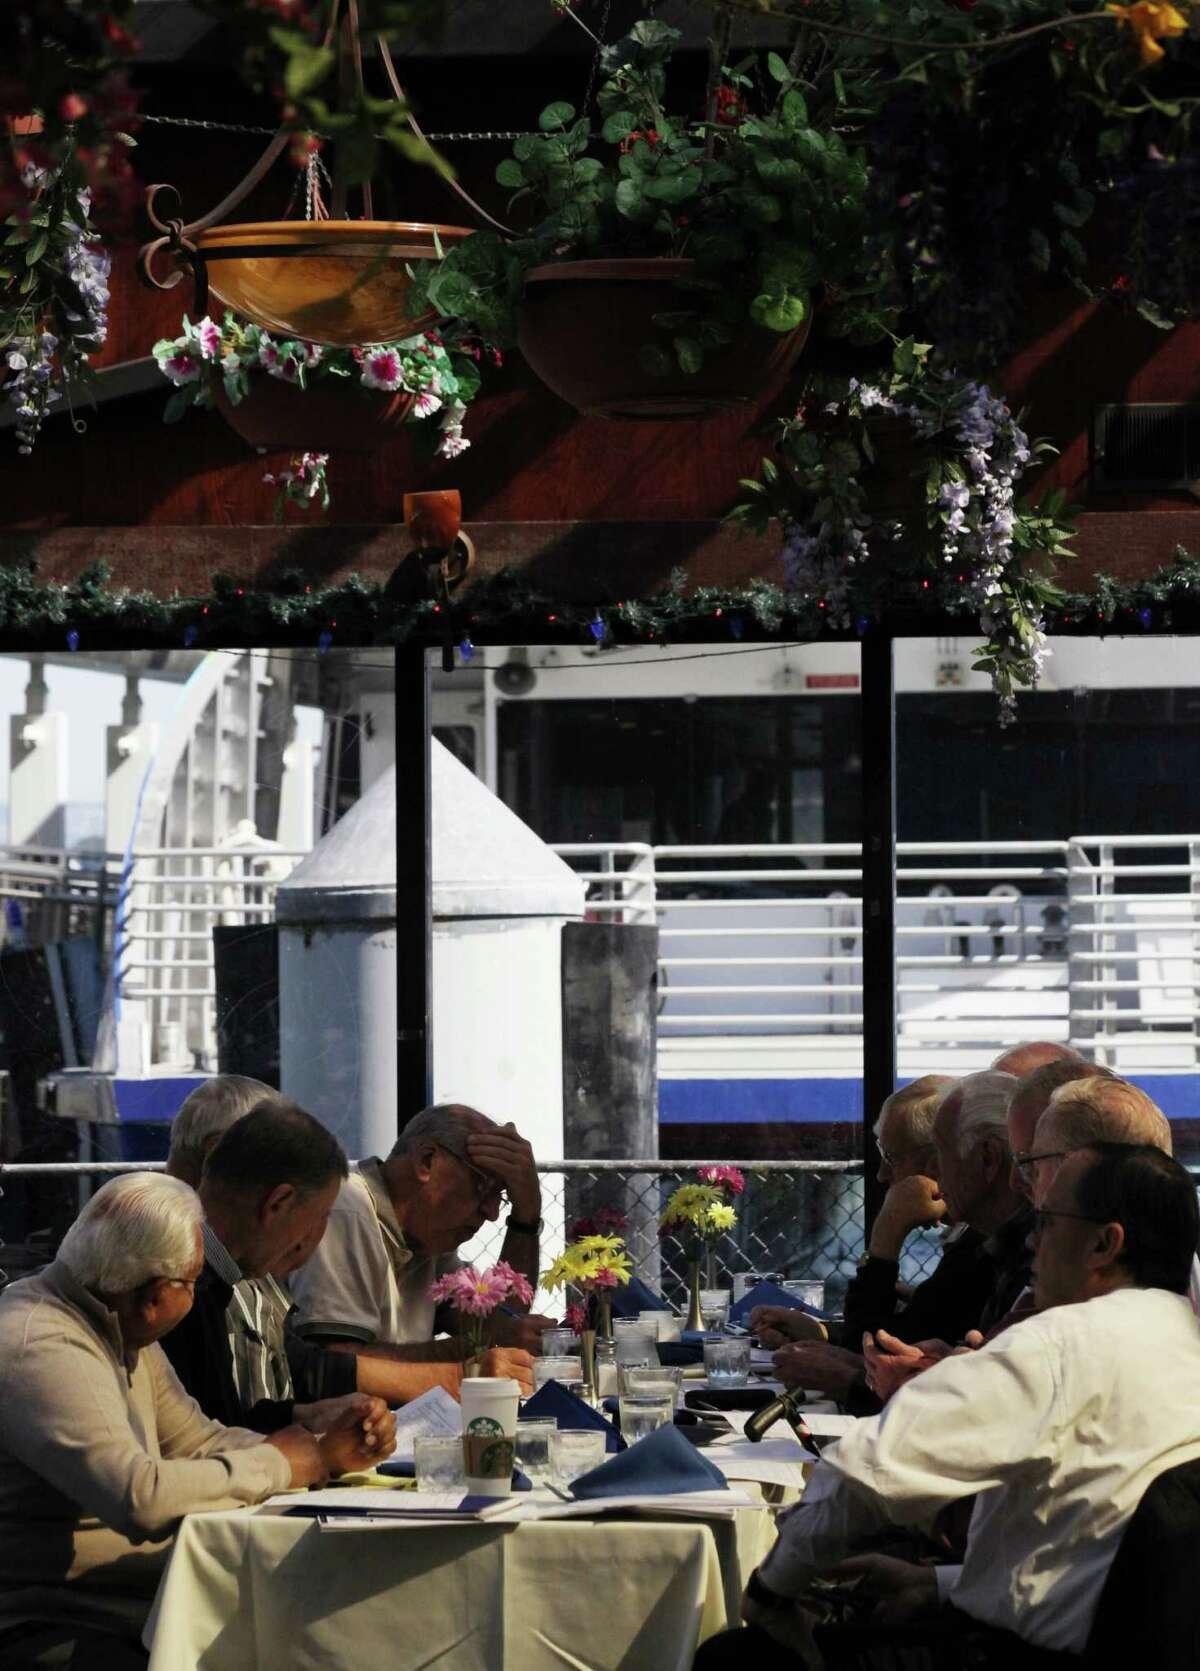 Gentlemen enjoying their lunch at Sinbad's Restaurant in San Francisco, Calif., Thursday March 5, 2015.